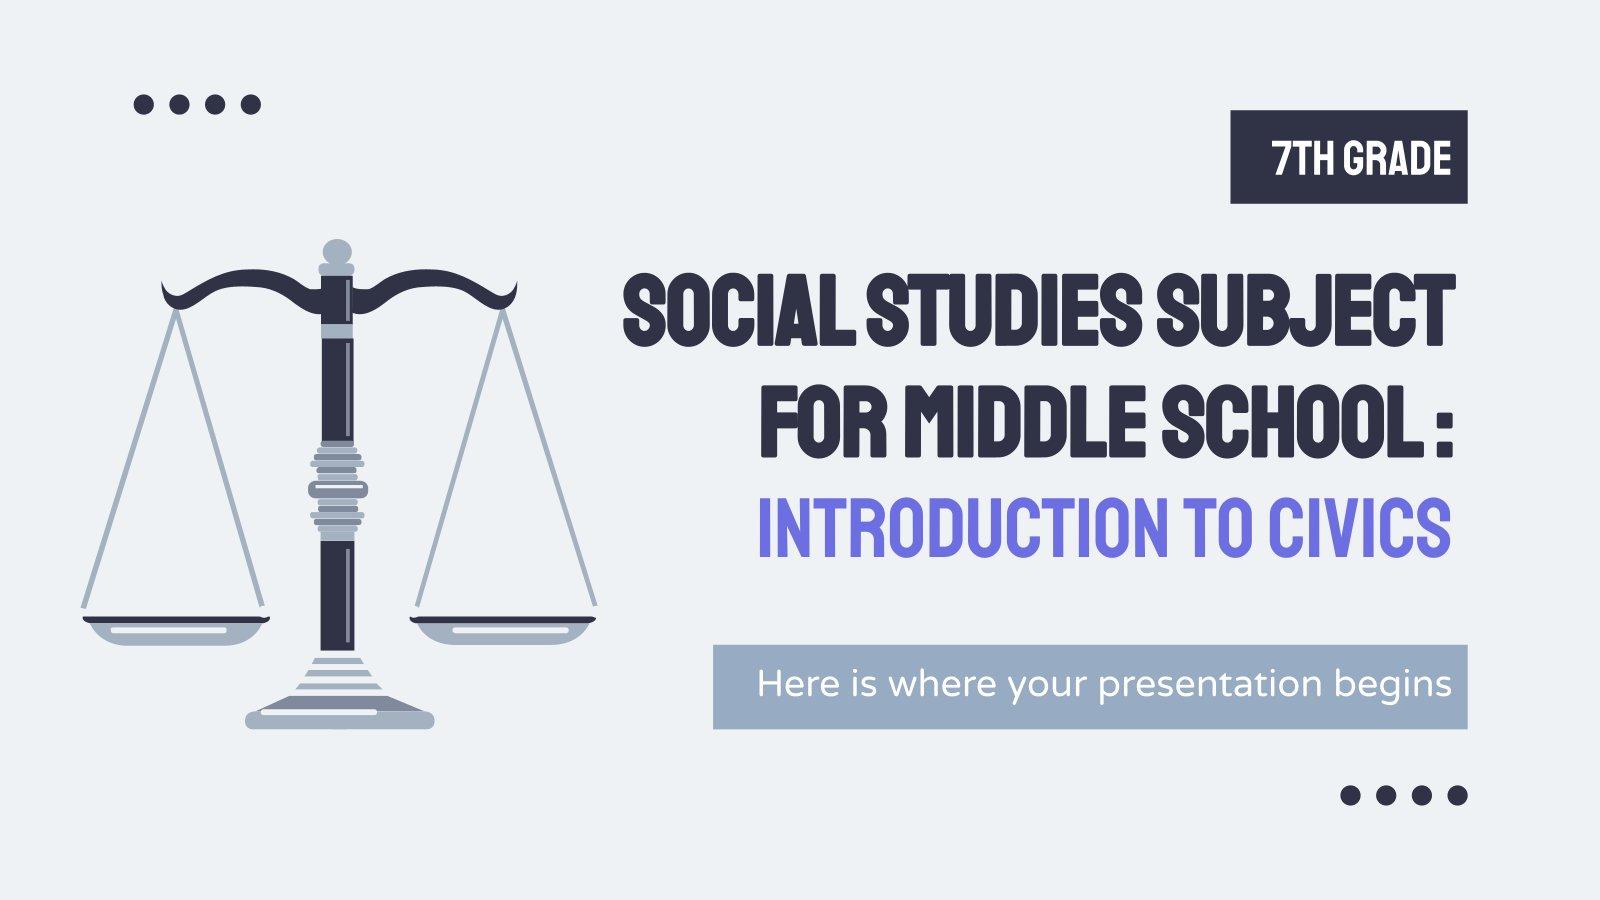 Plantilla de presentación Sociales para secundaria: Educación Cívica